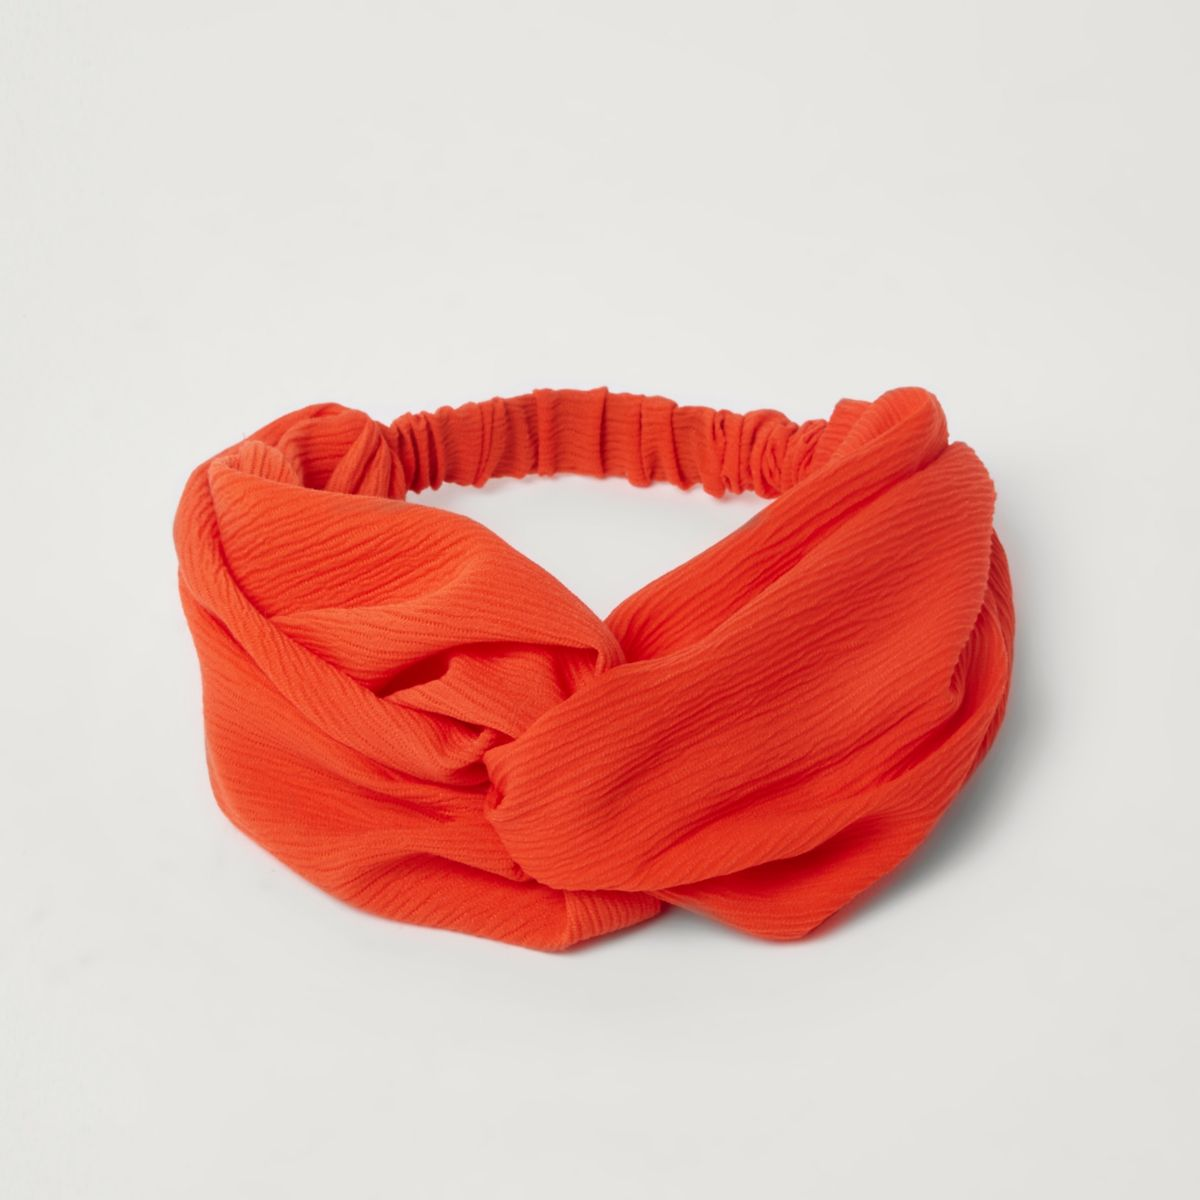 Red wide twist headband